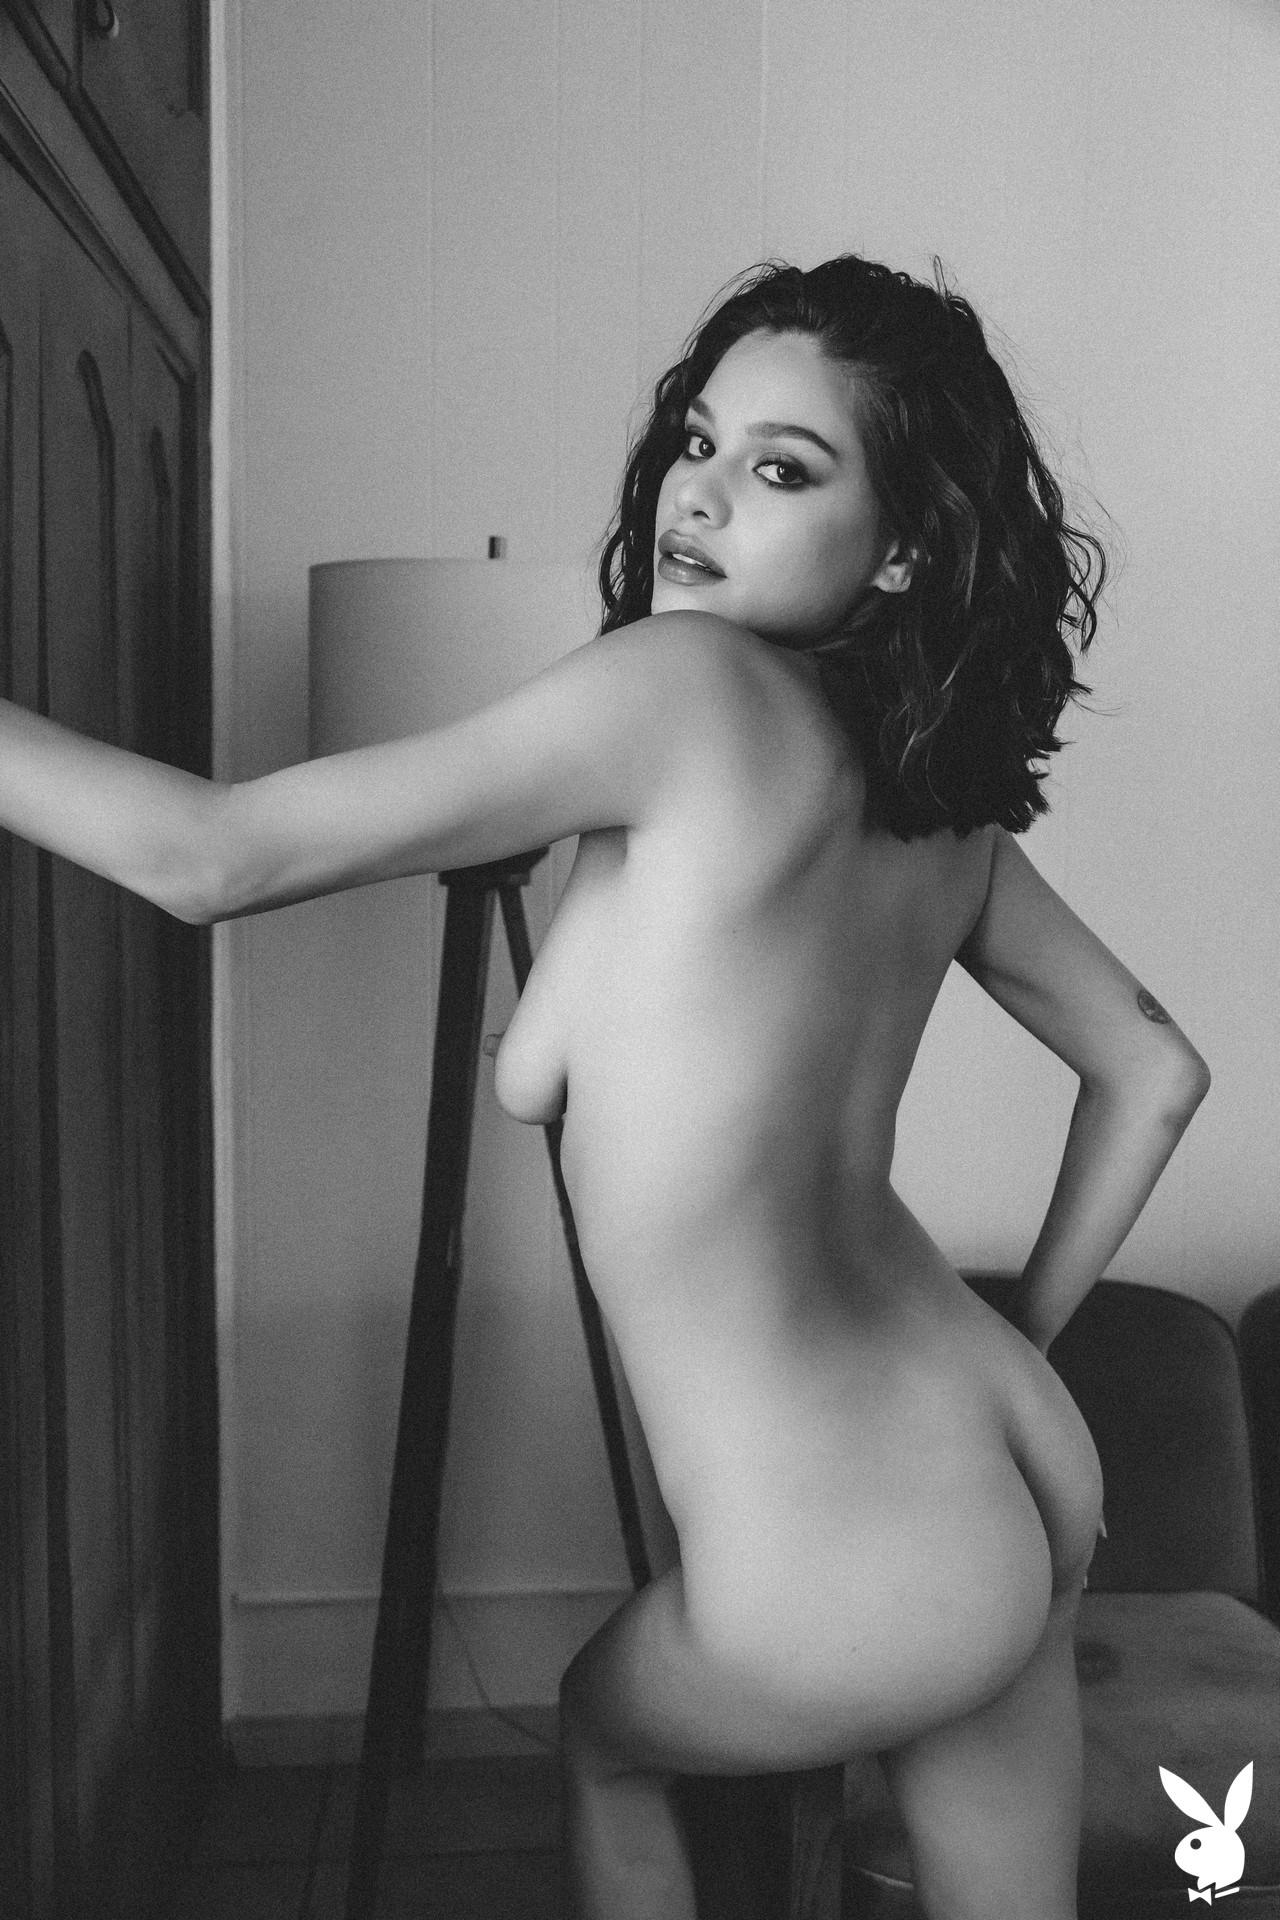 Natalie Del Real In The Simple Things Playboy Plus (28)